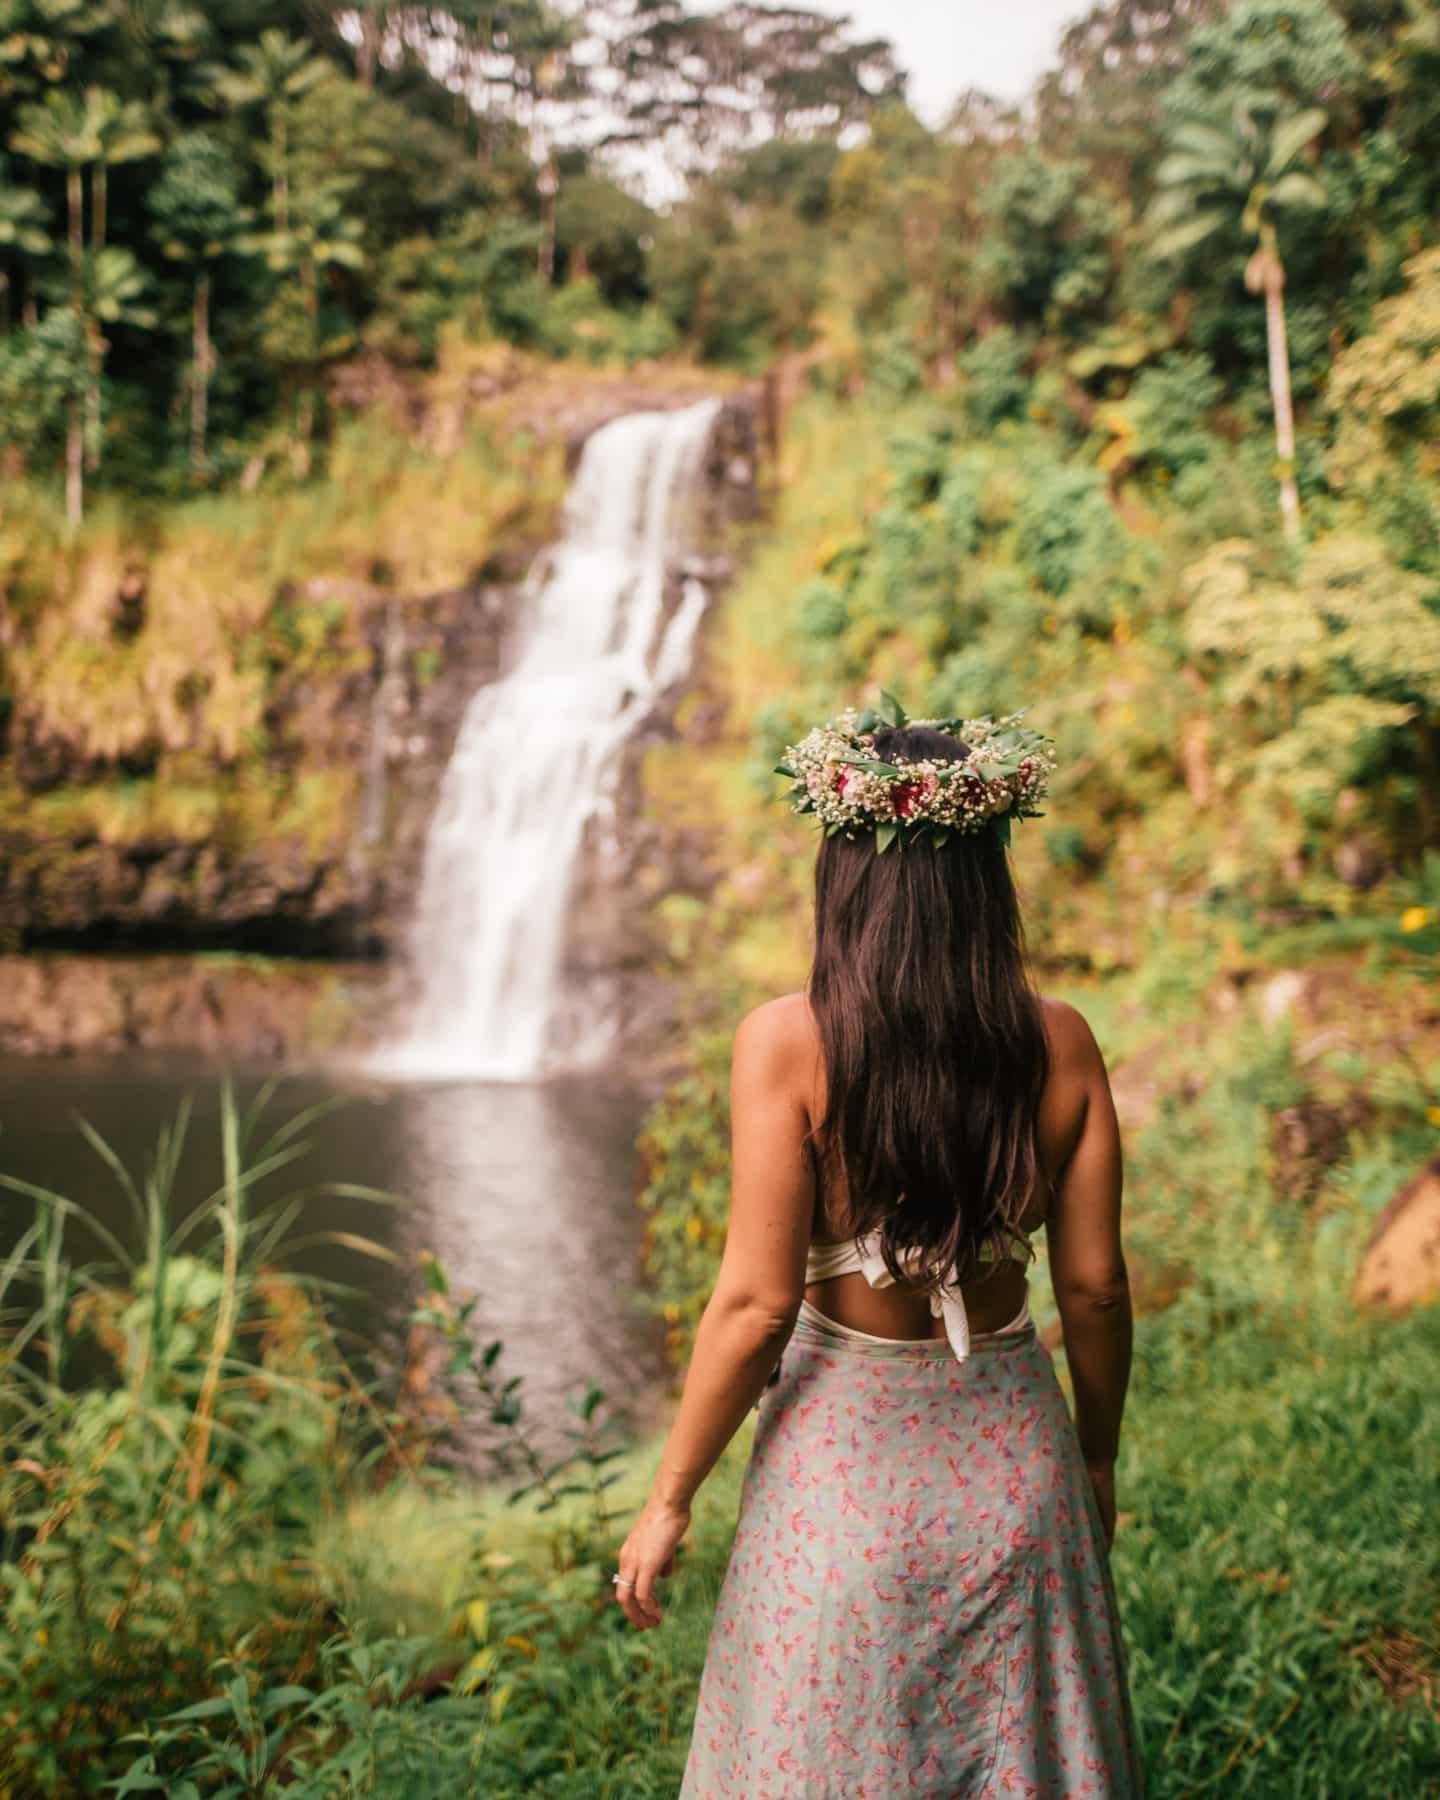 40 Things to Do on the Big Island, Hawaii